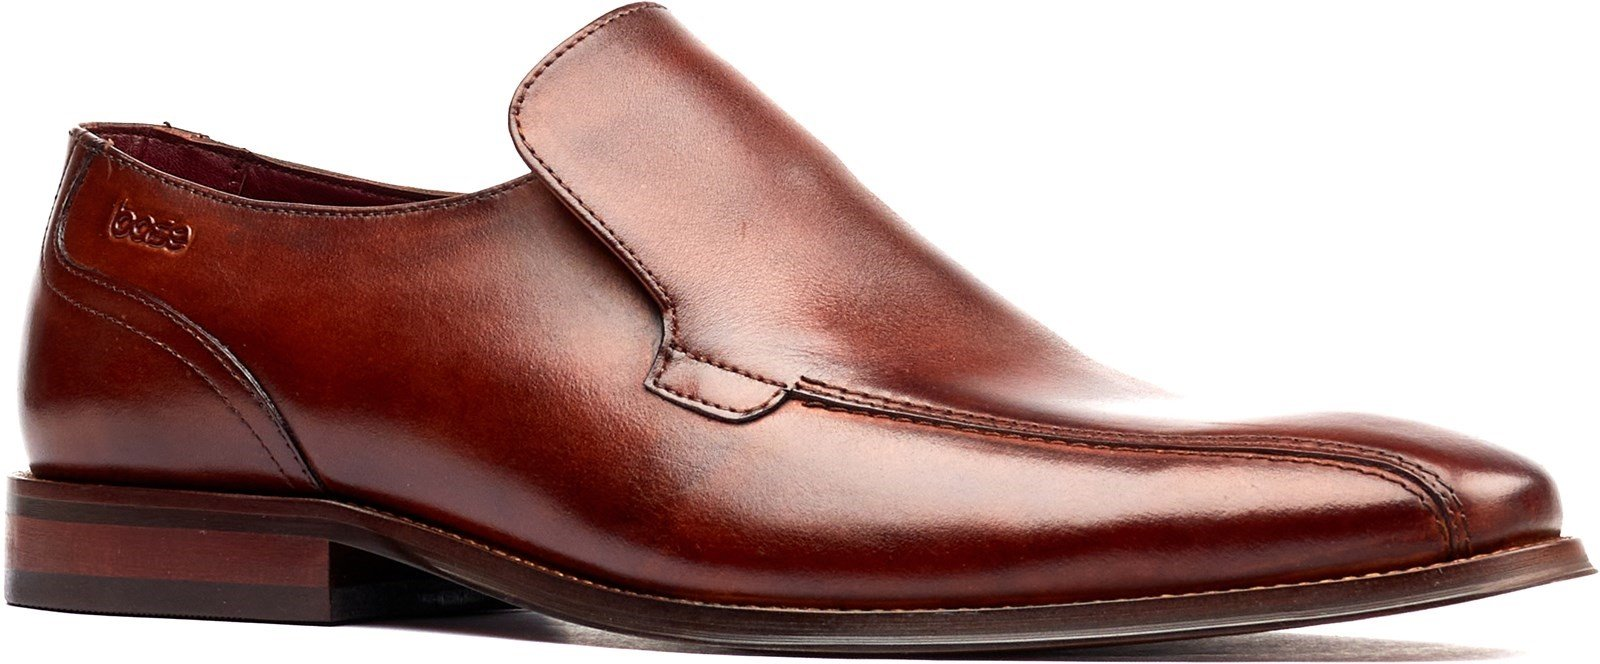 Base London Men's Jacob Slip On Loafer Tan 32252 - Tan 6